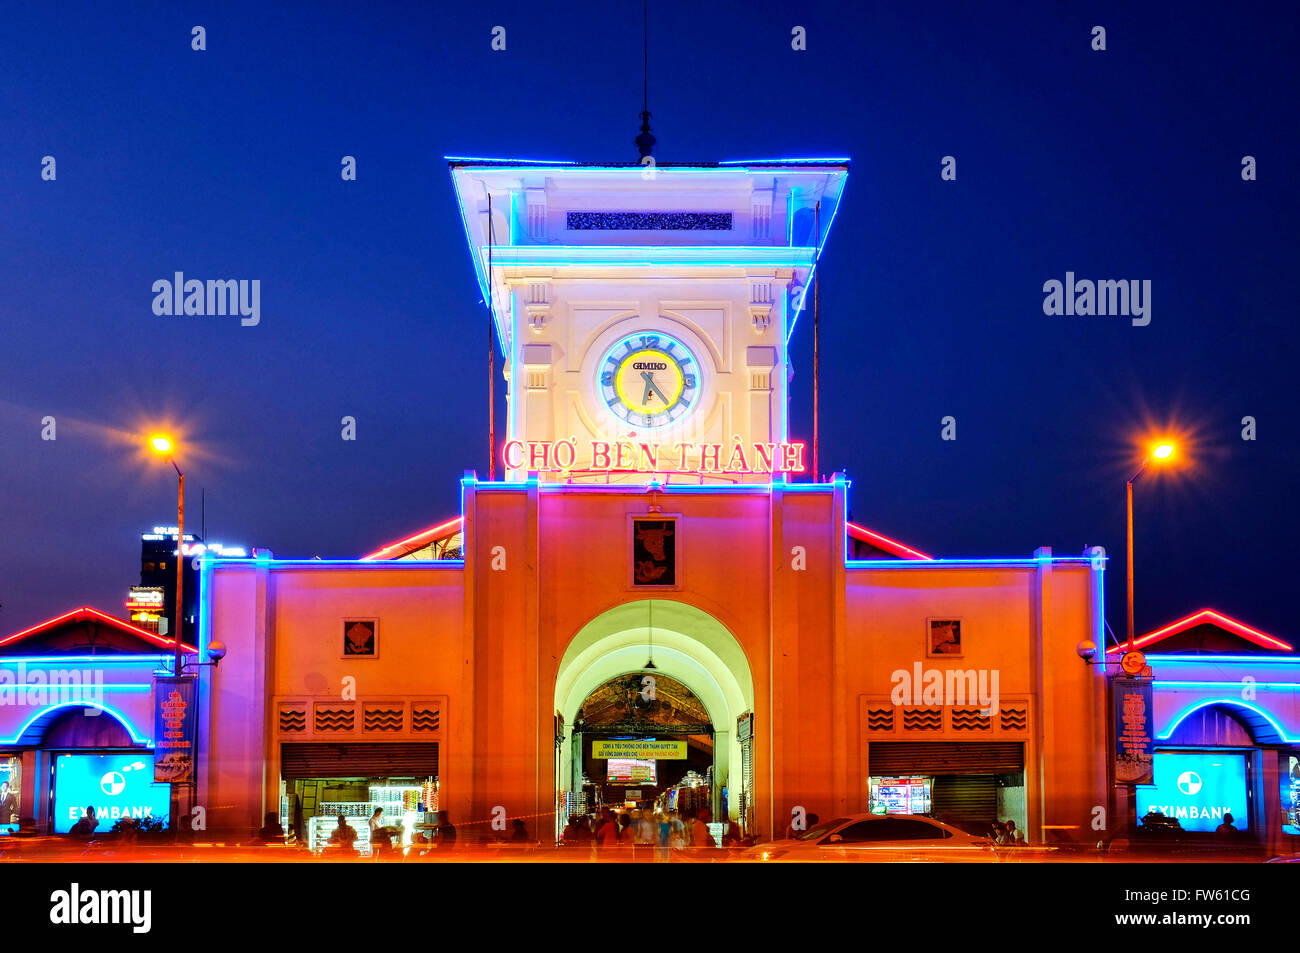 Ben Thanh Market, Ho Chi Minh City, Vietnam - Stock Image